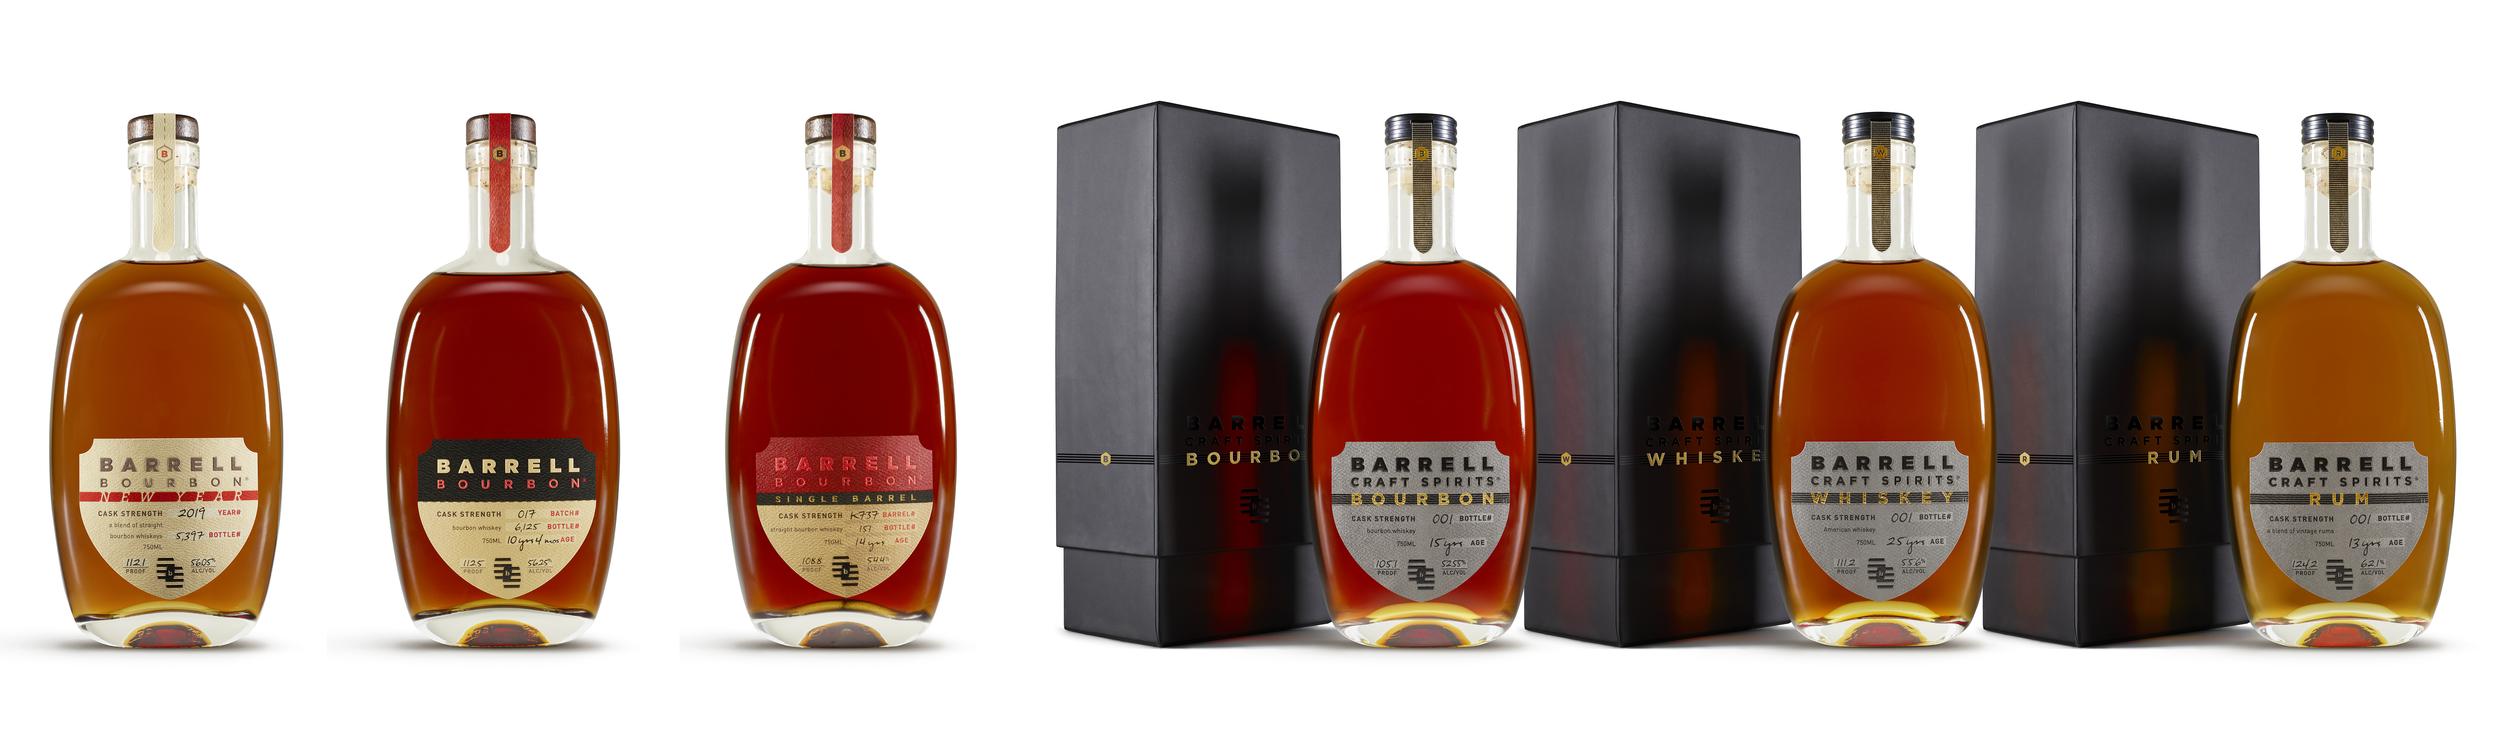 BourbonFamilyLineup_wBOX_onwhite.png